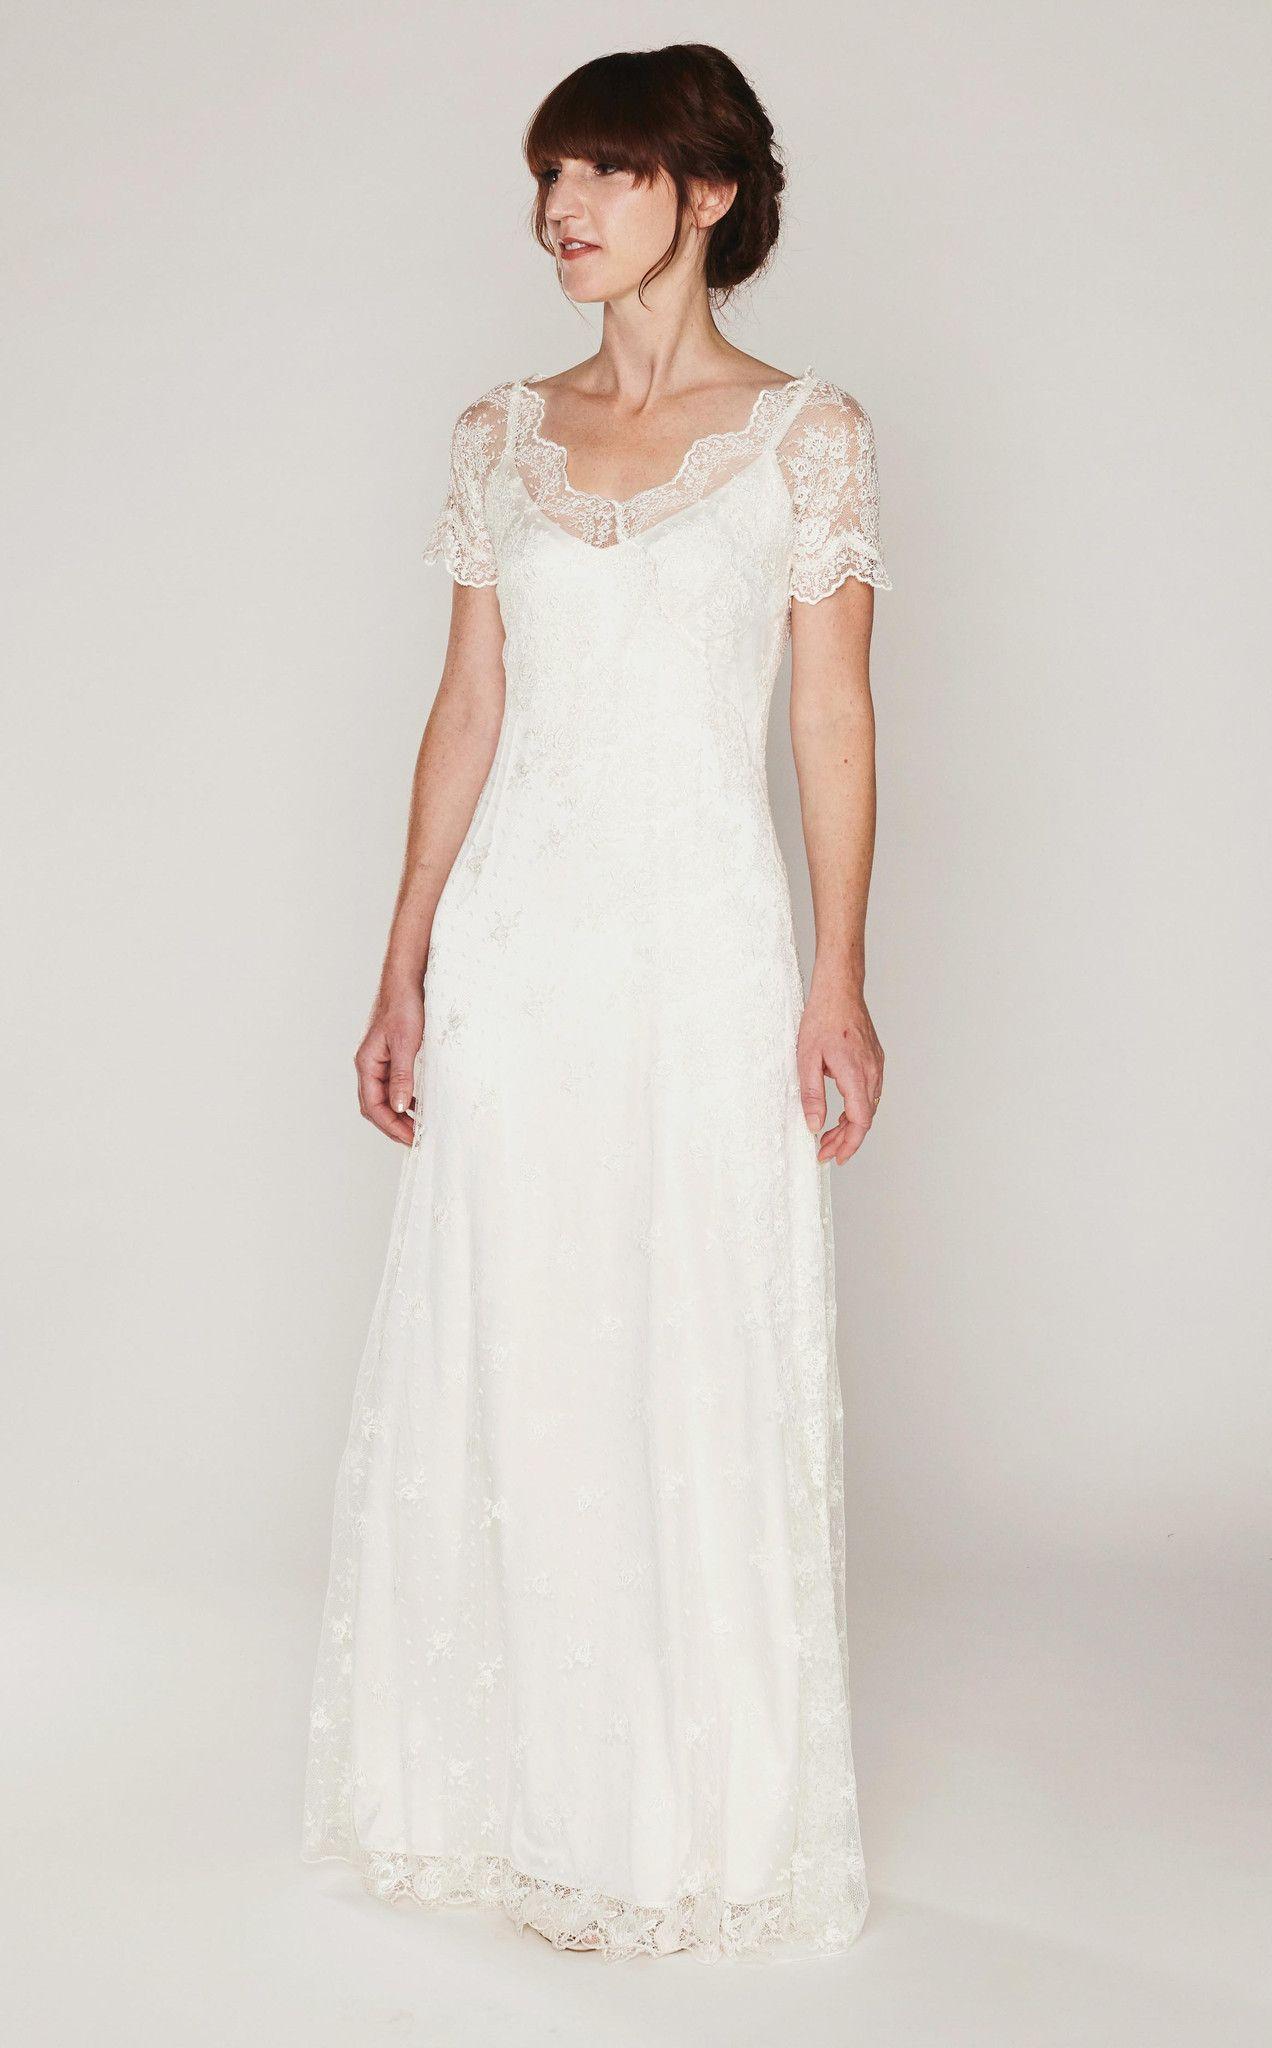 Mia Wedding Dresses Casual Wedding Dress Vintage Style Wedding Dresses [ 2048 x 1272 Pixel ]